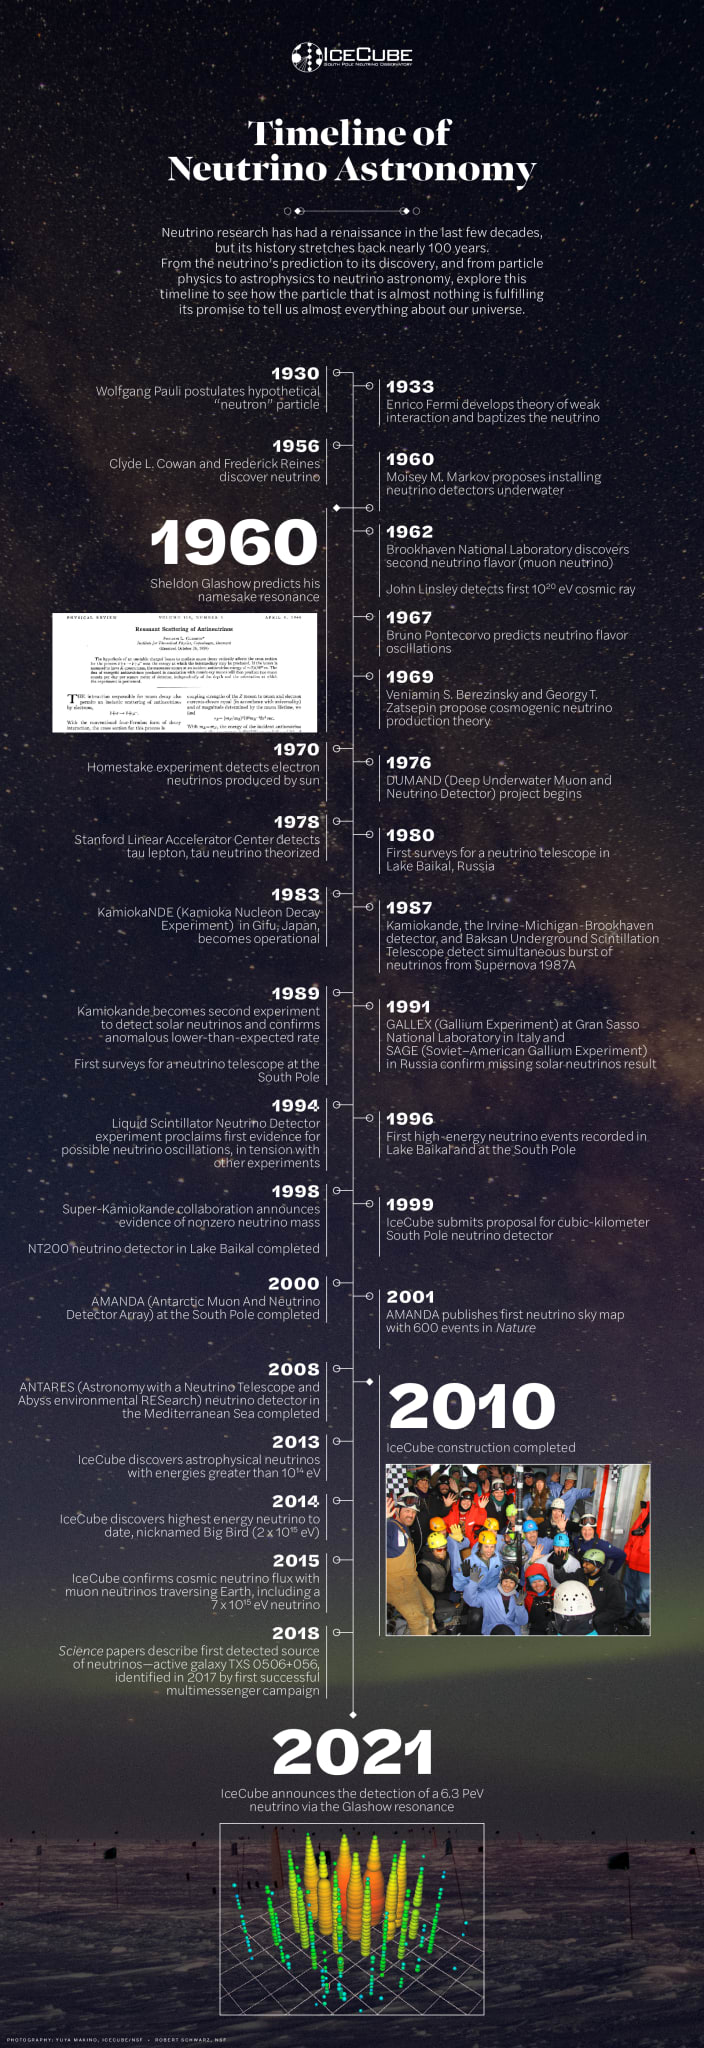 Timeline of Neutrino Astronomy